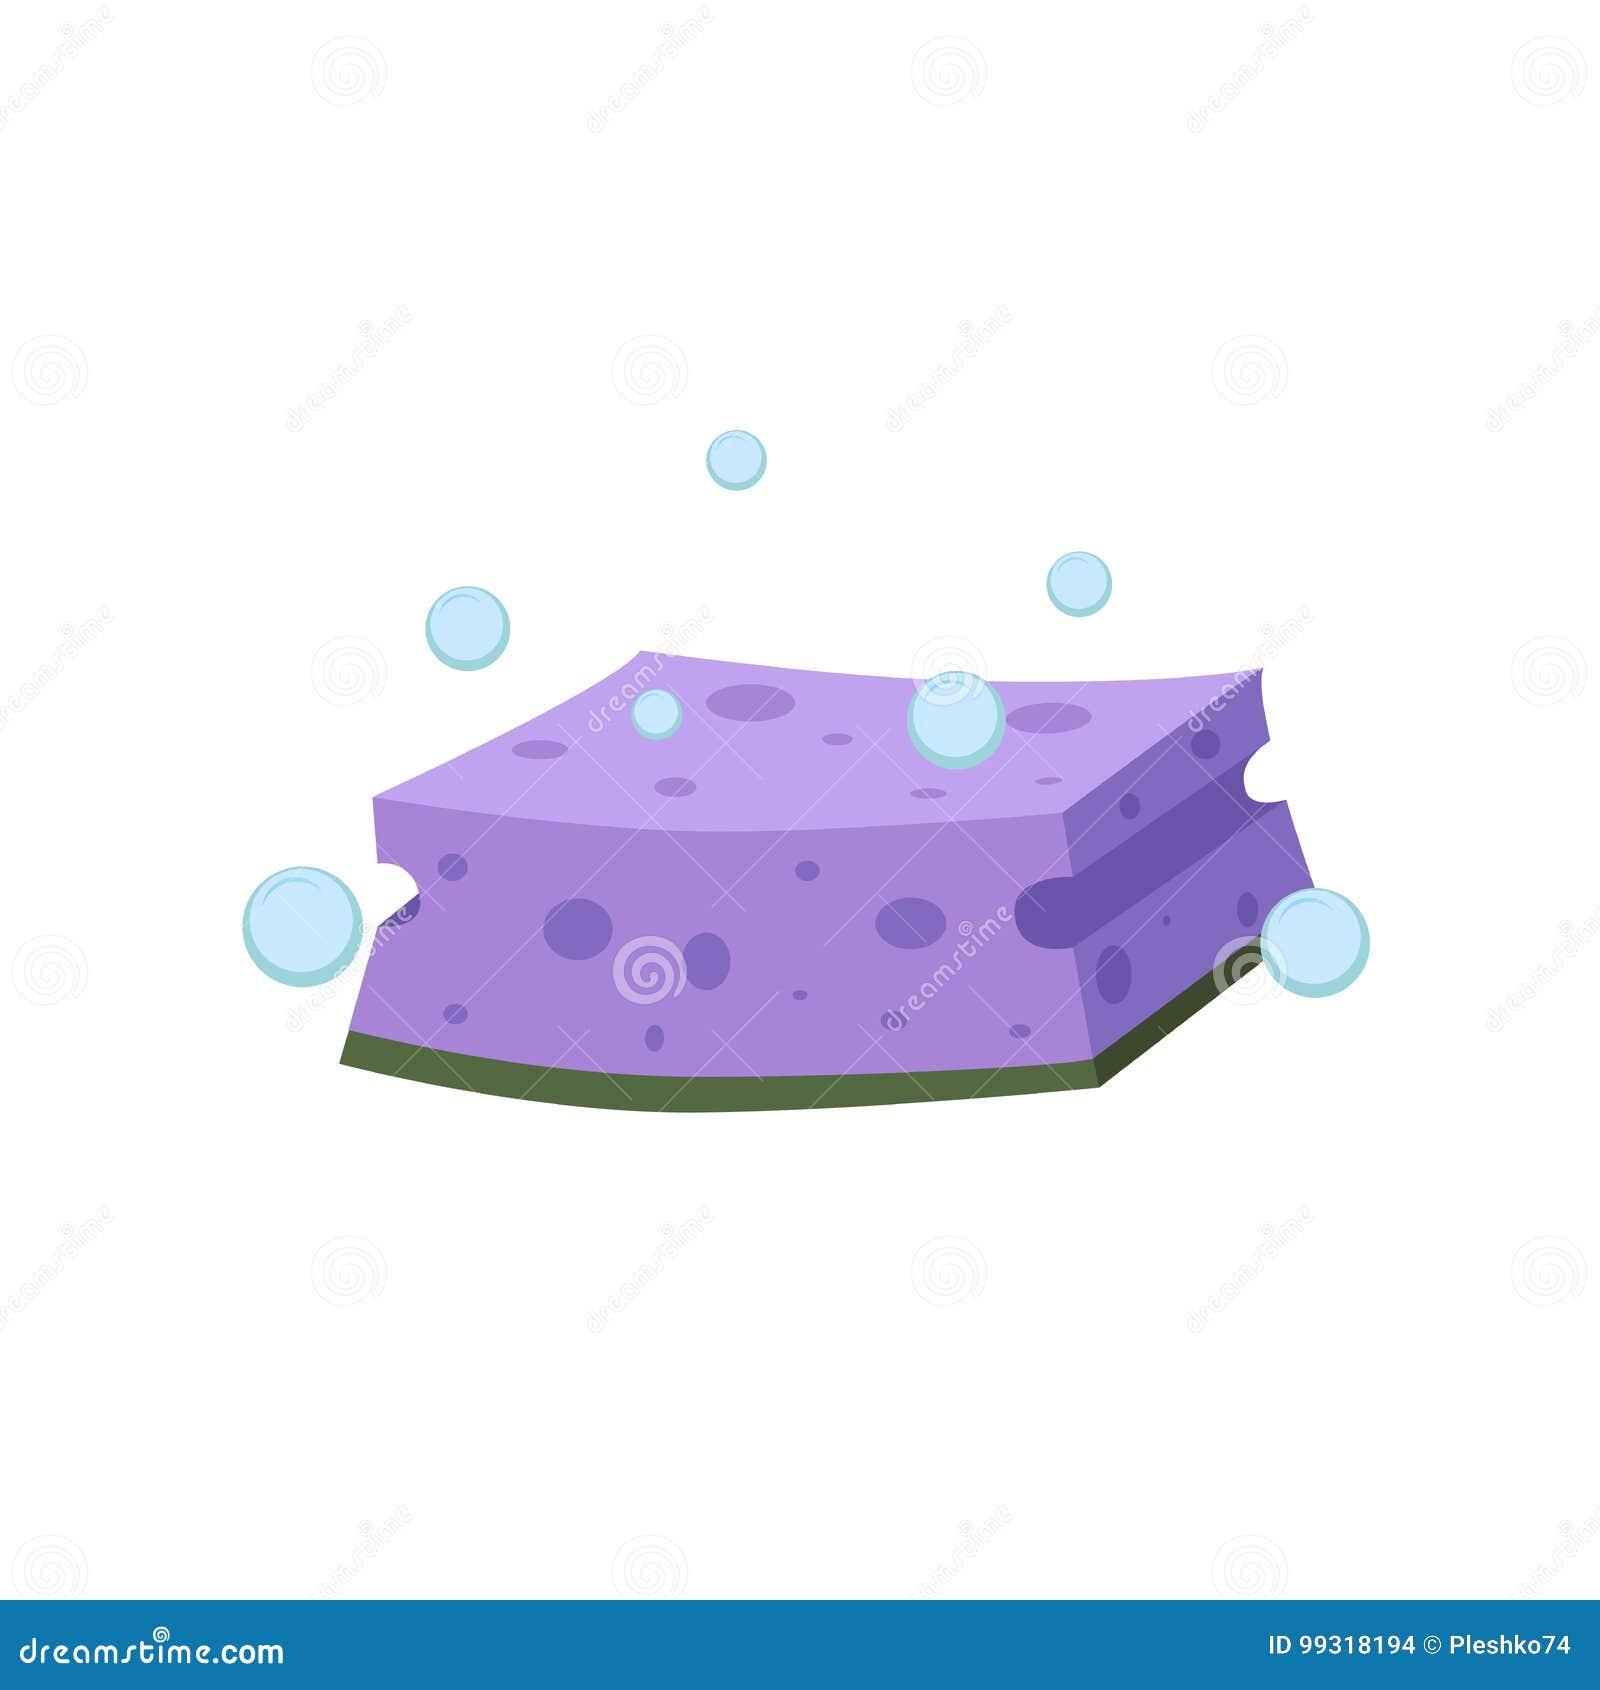 Cartoon Flat Design Washing Sponge. Kitchen And Bath